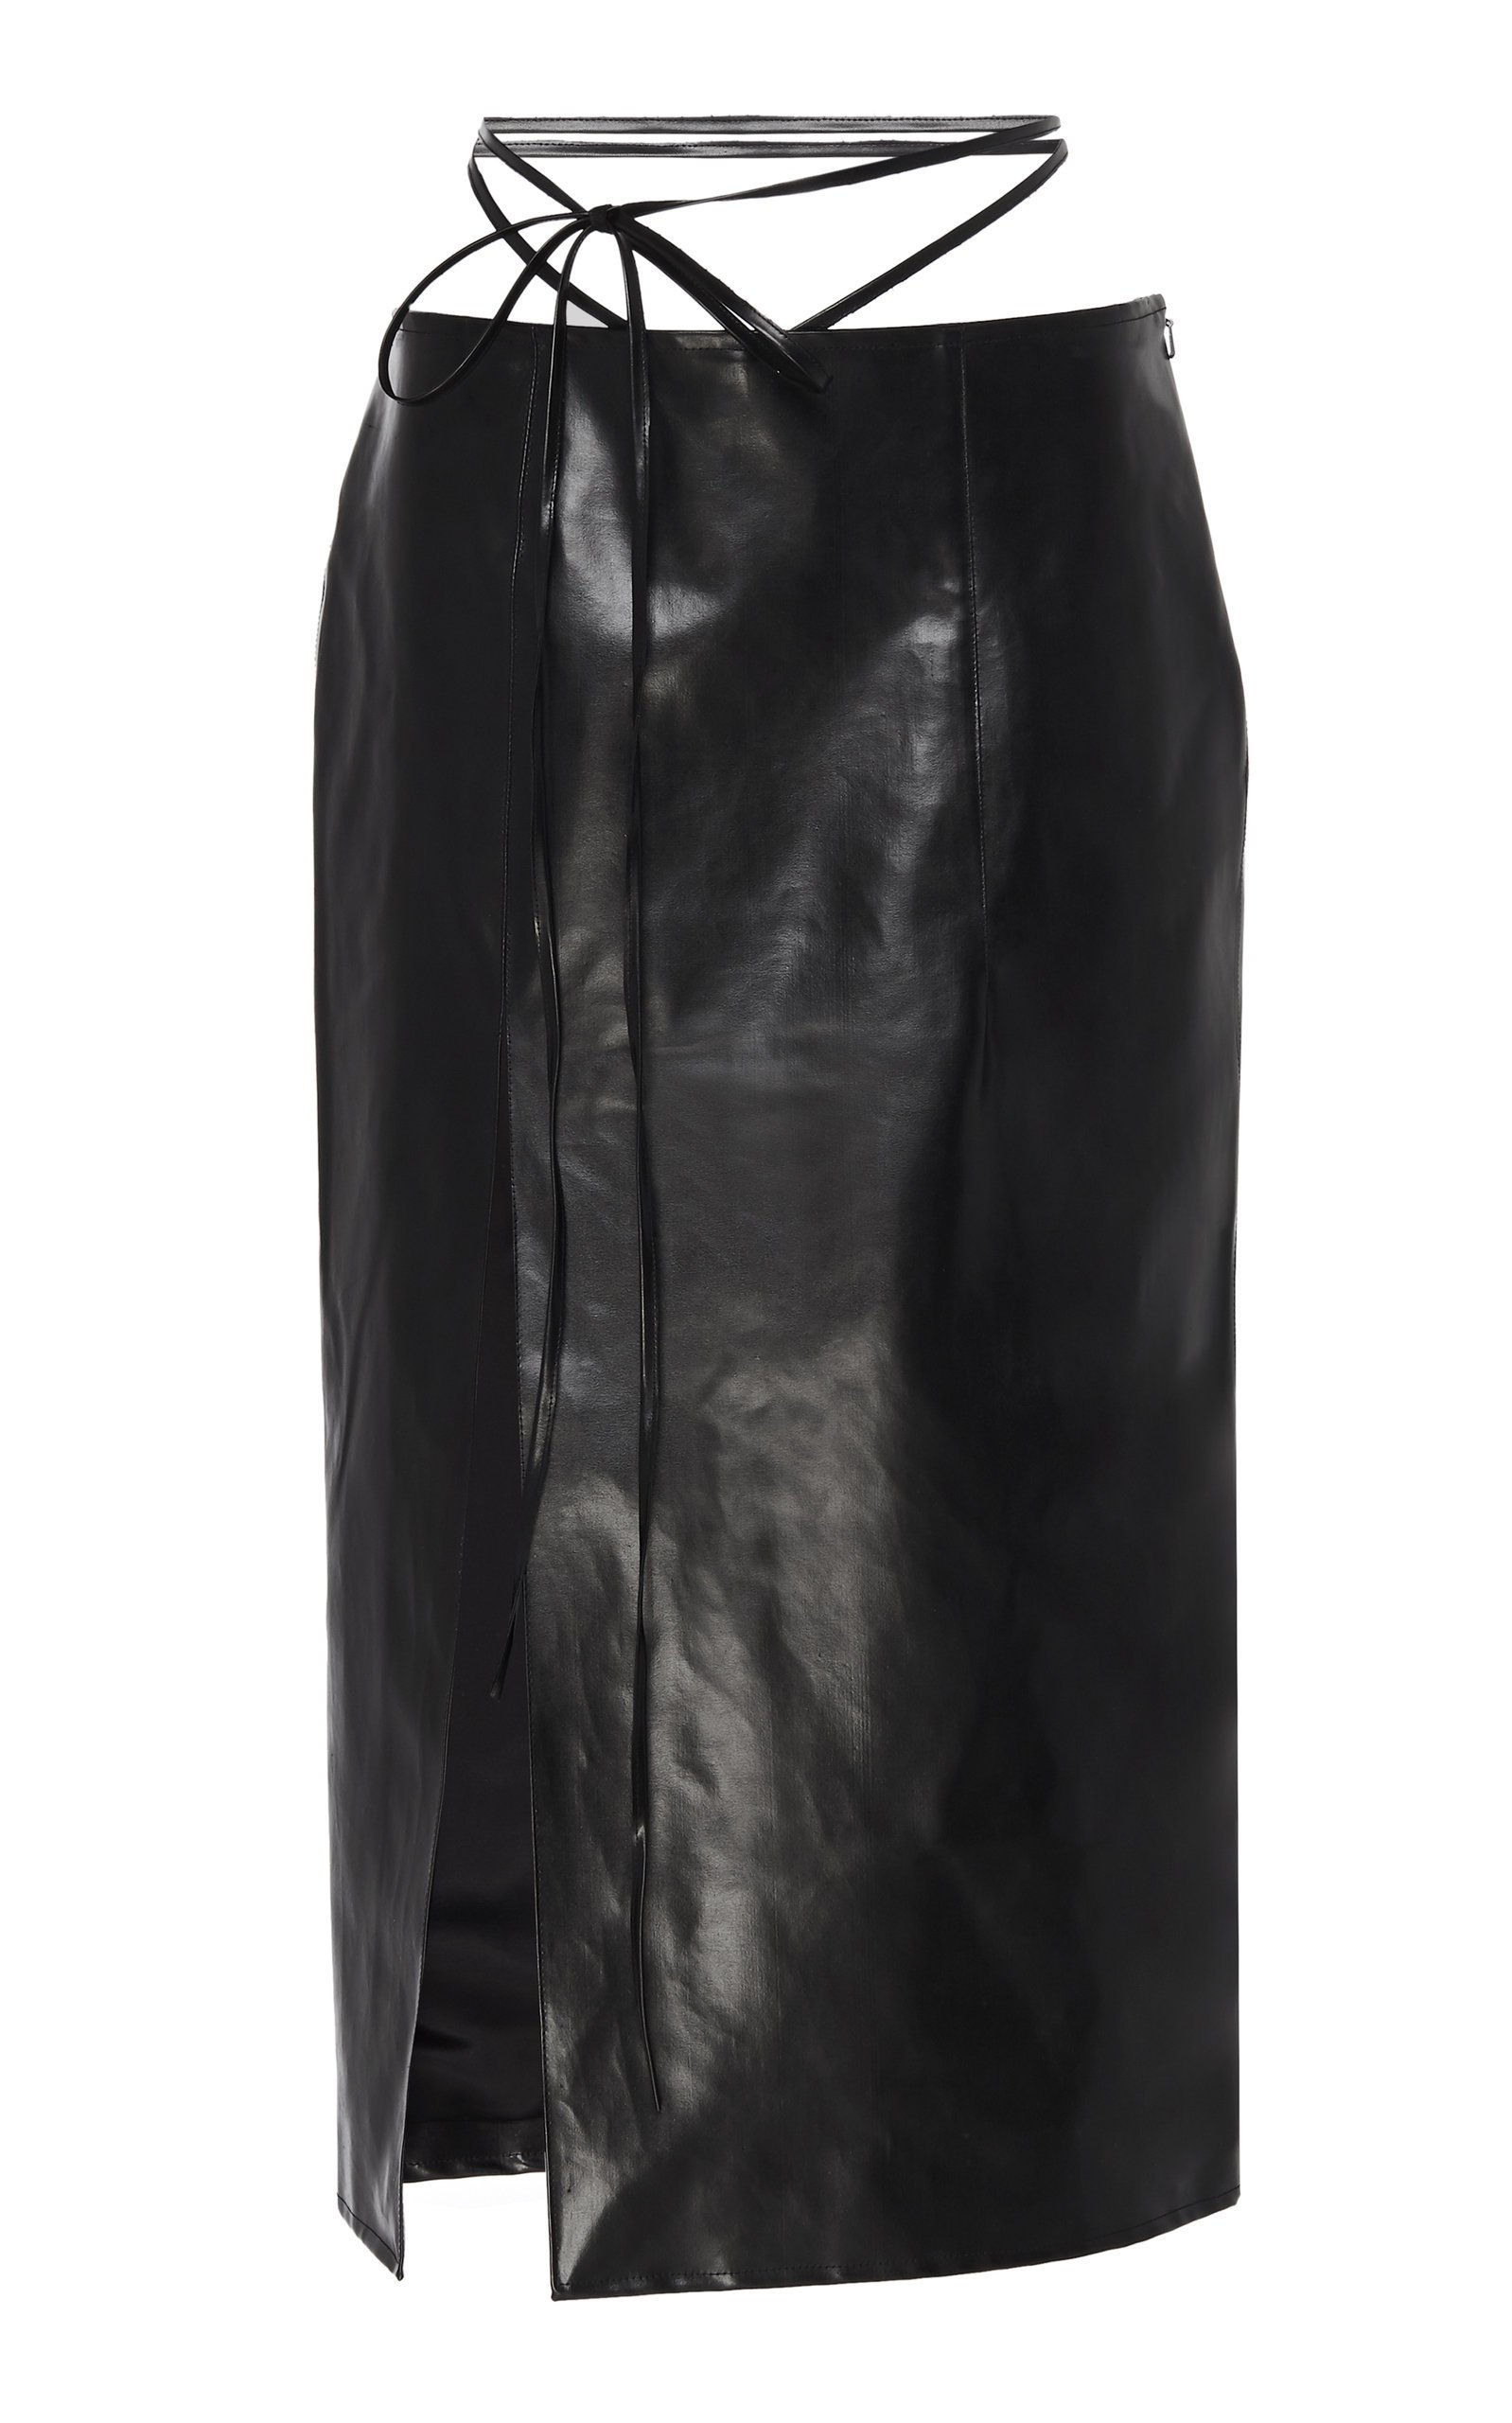 Supriya Lele Vinyl Pencil Skirt Size: XS